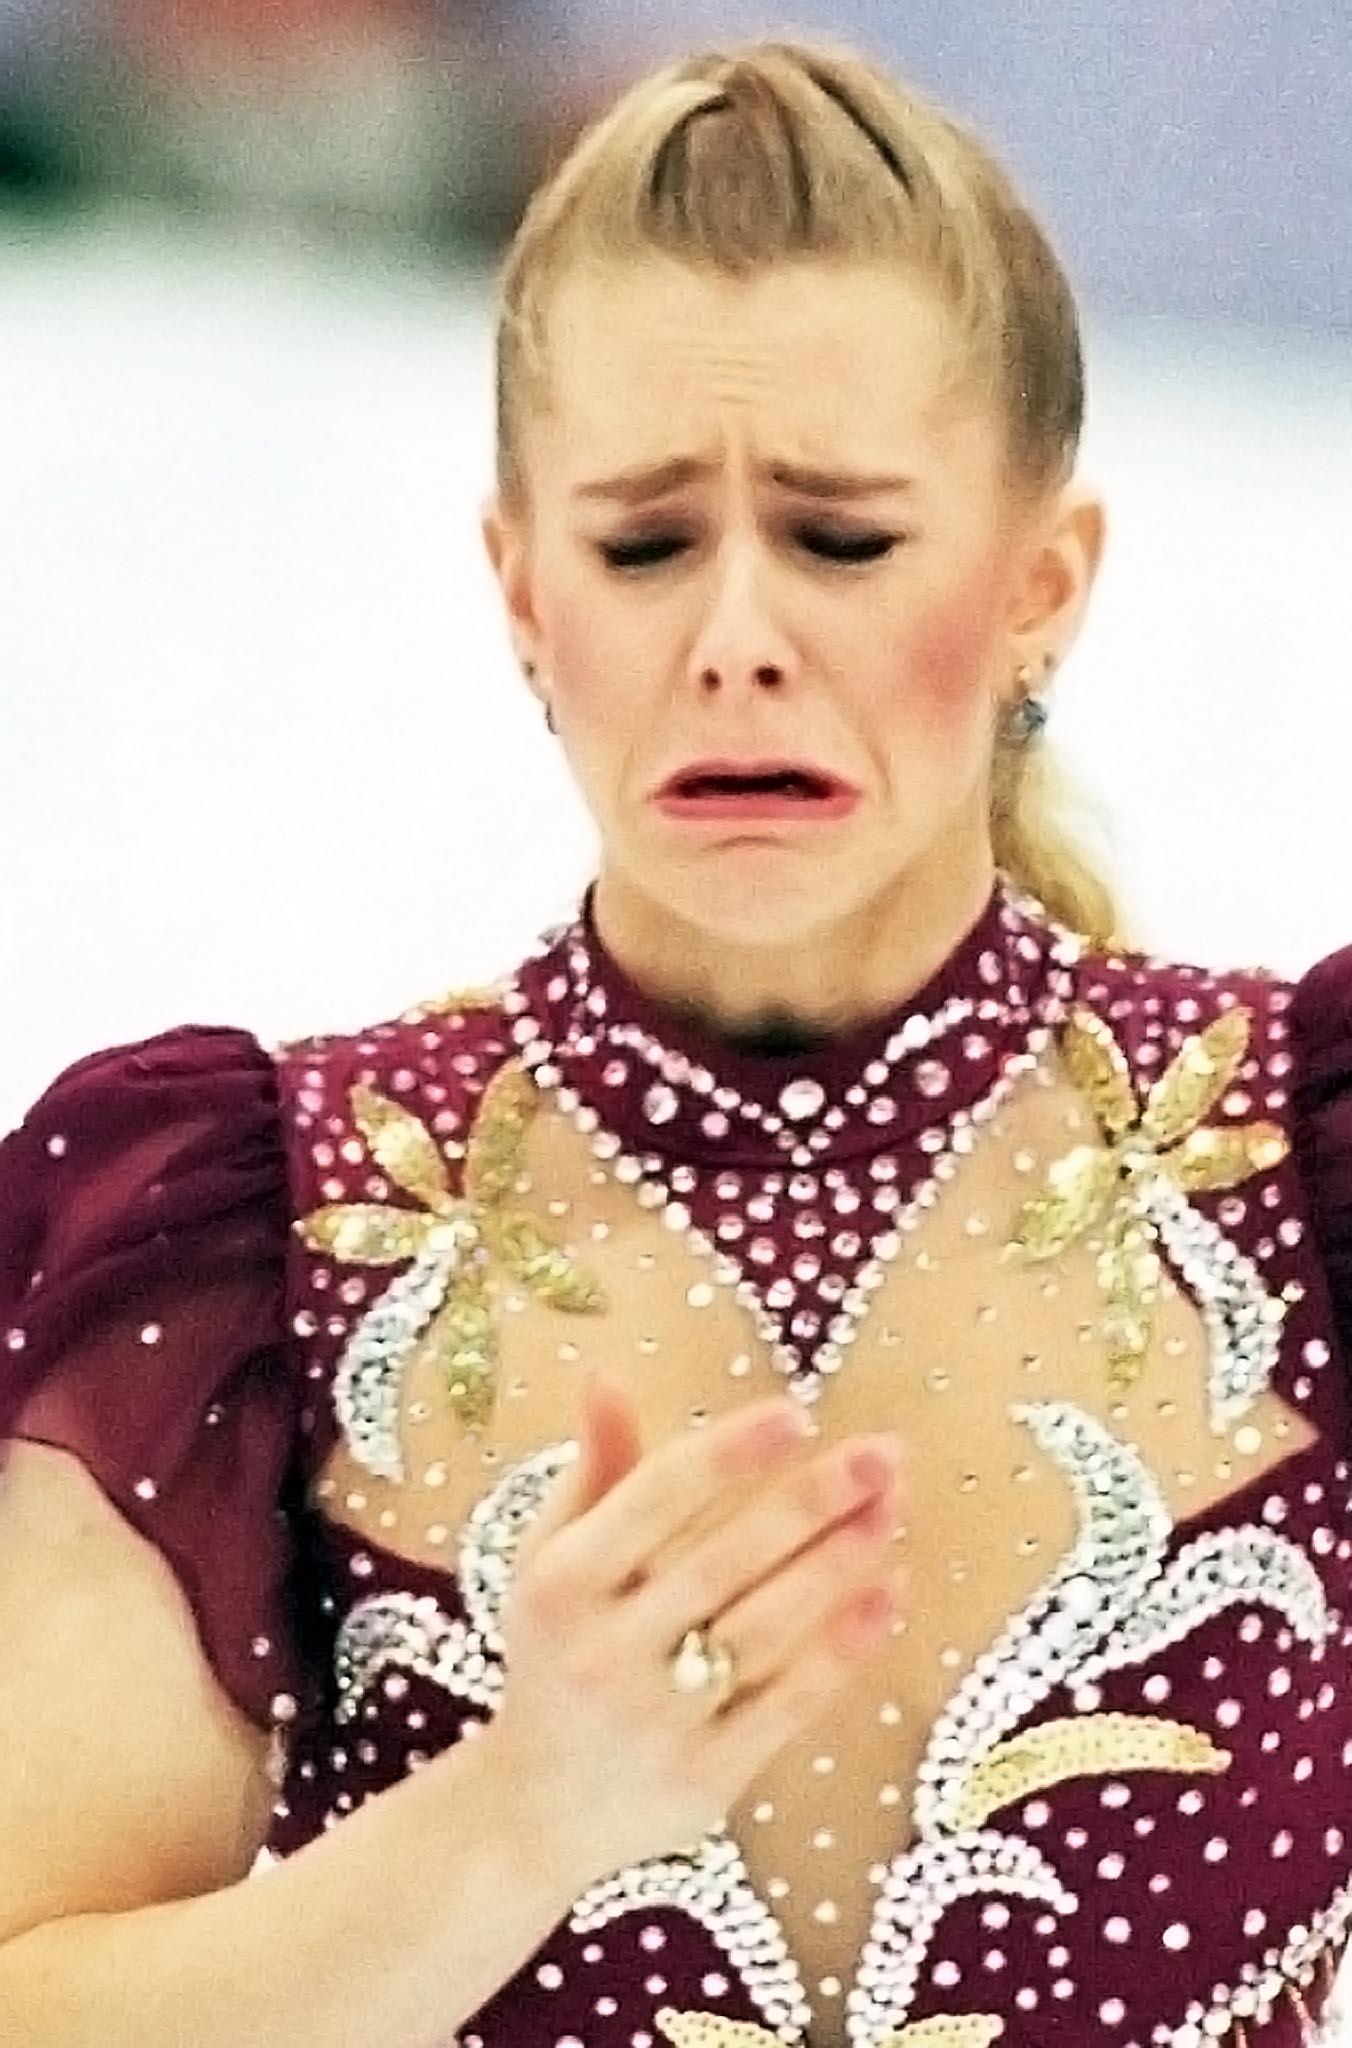 olympics-crying-faces-harding1.jpg